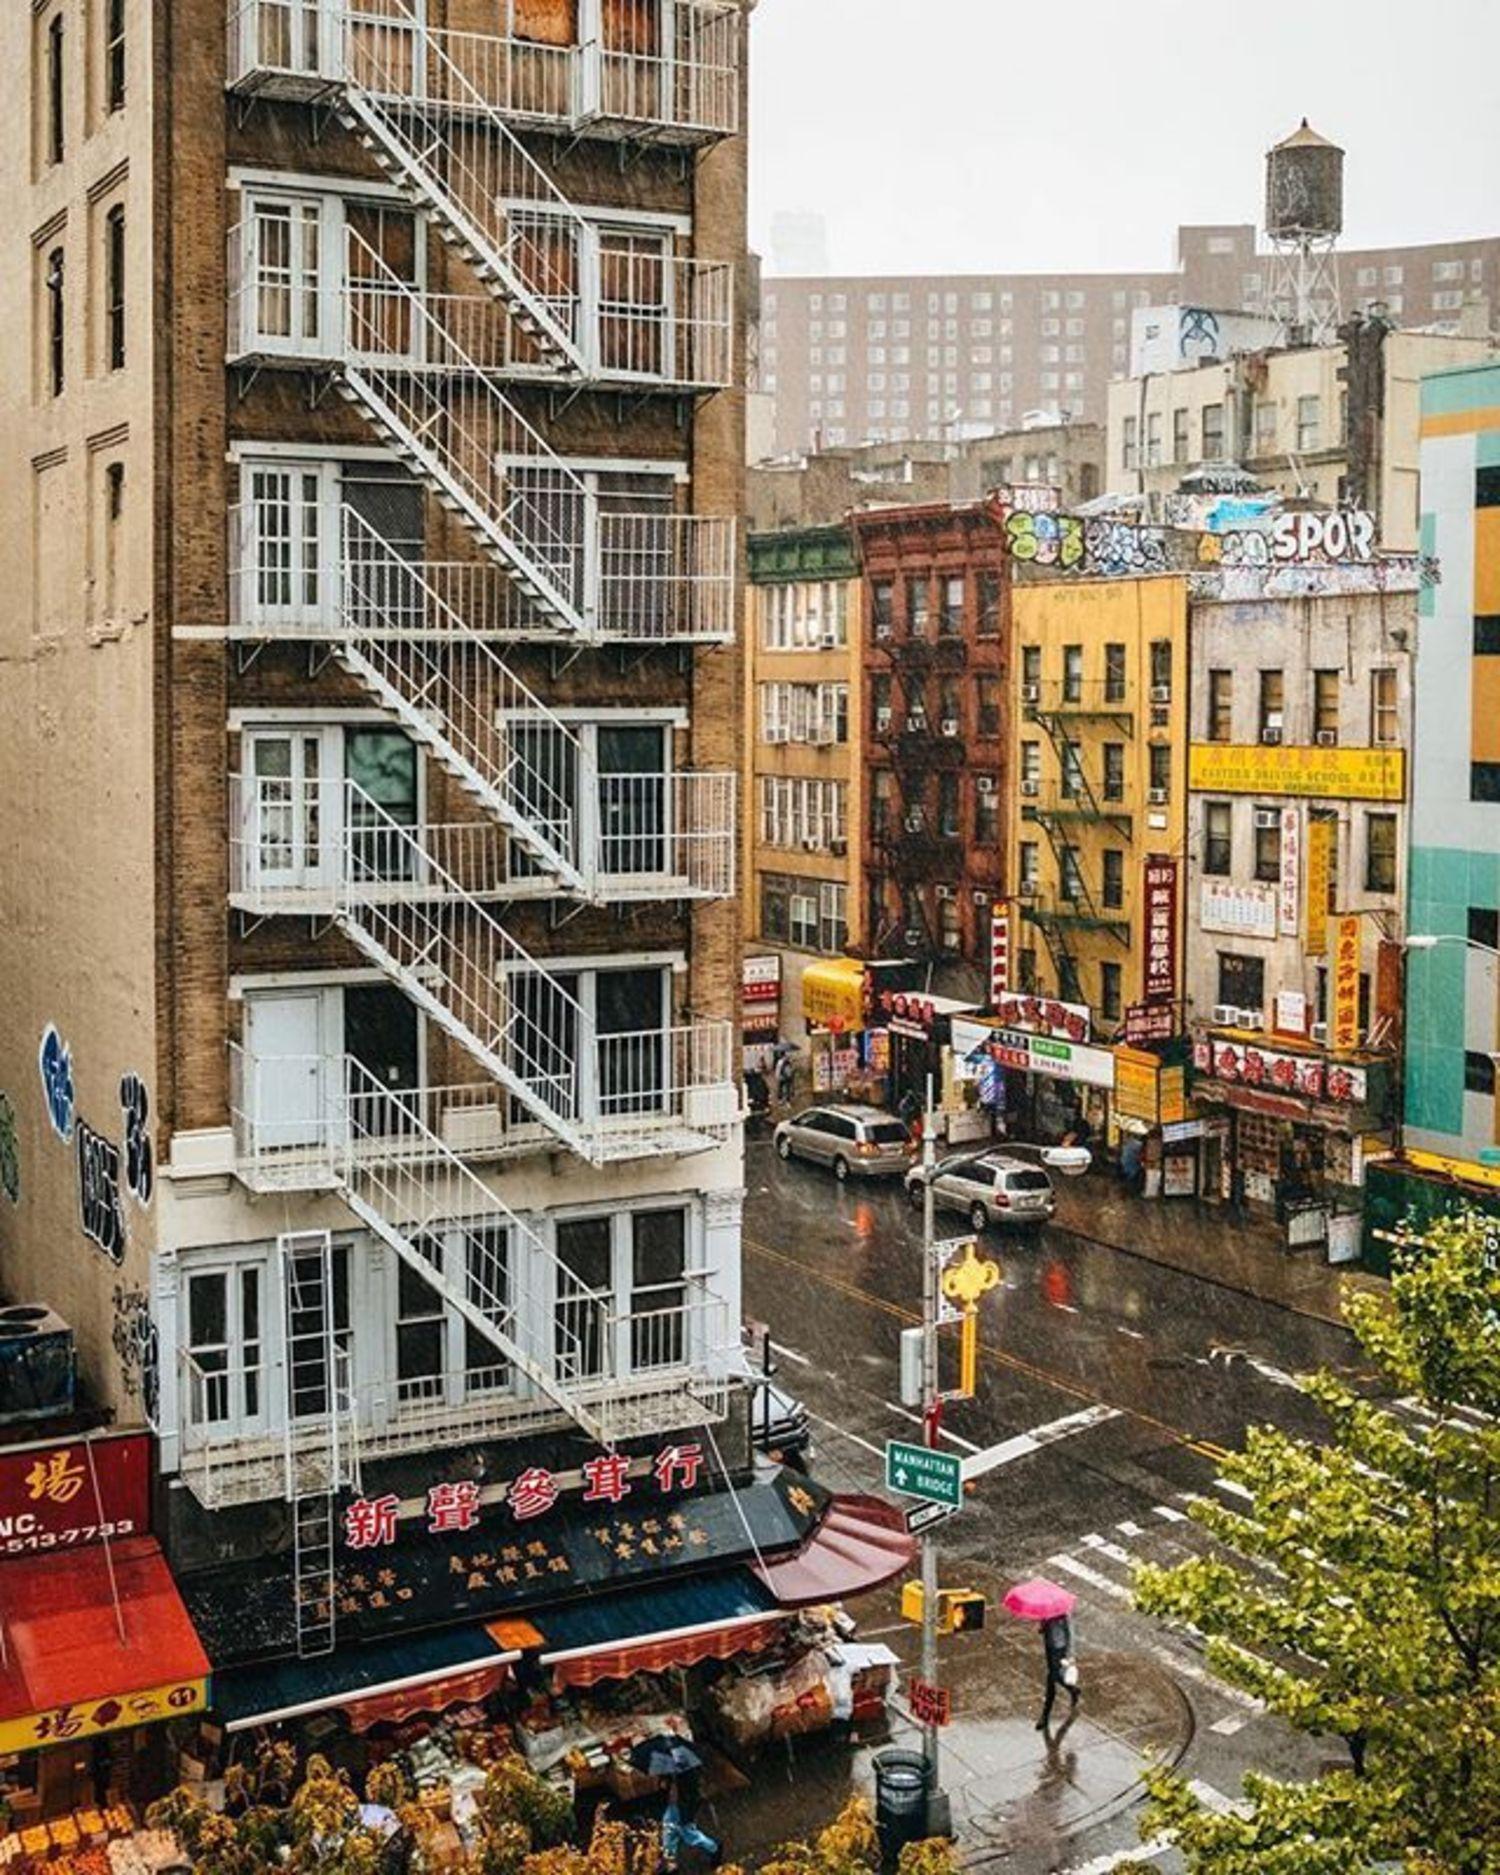 Chinatown, New York. Photo via @doubleshockpower #viewingnyc #newyork #newyorkcity #nyc